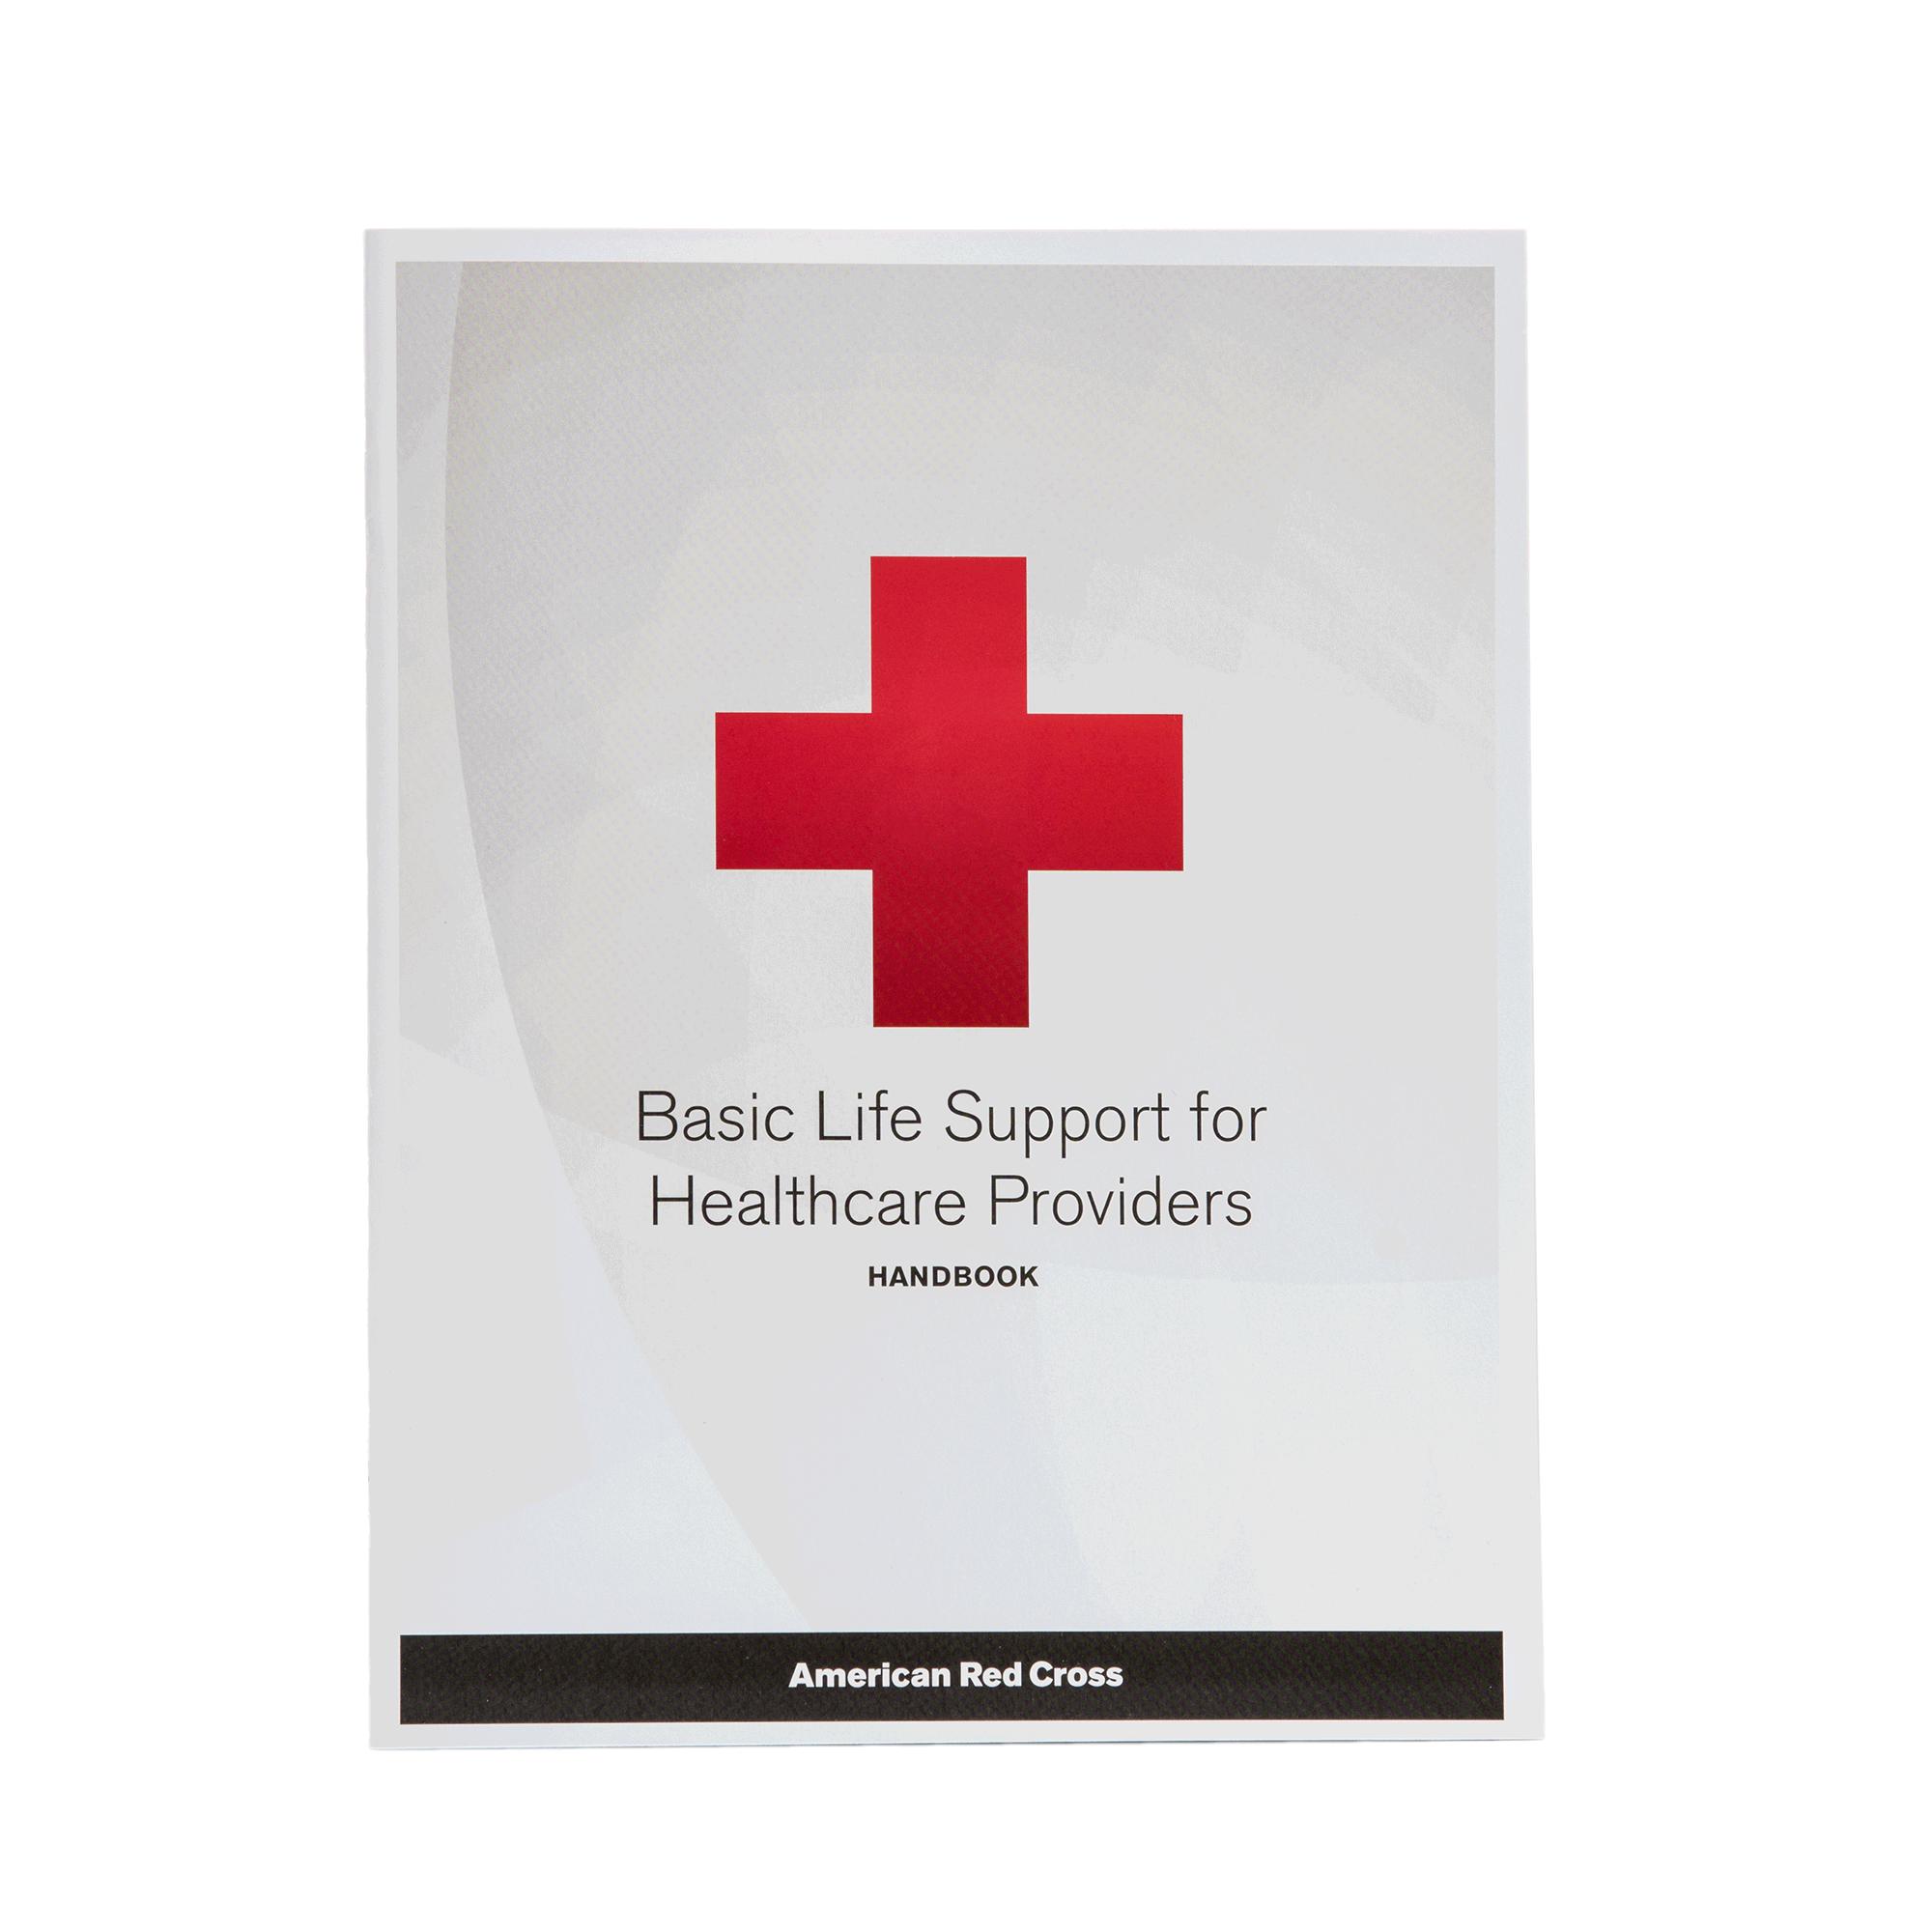 6807a2fe06bc ... Array - manitou mt 1840 manual ebook rh manitou mt 1840 manual ebook  aldantest us array first aid ...